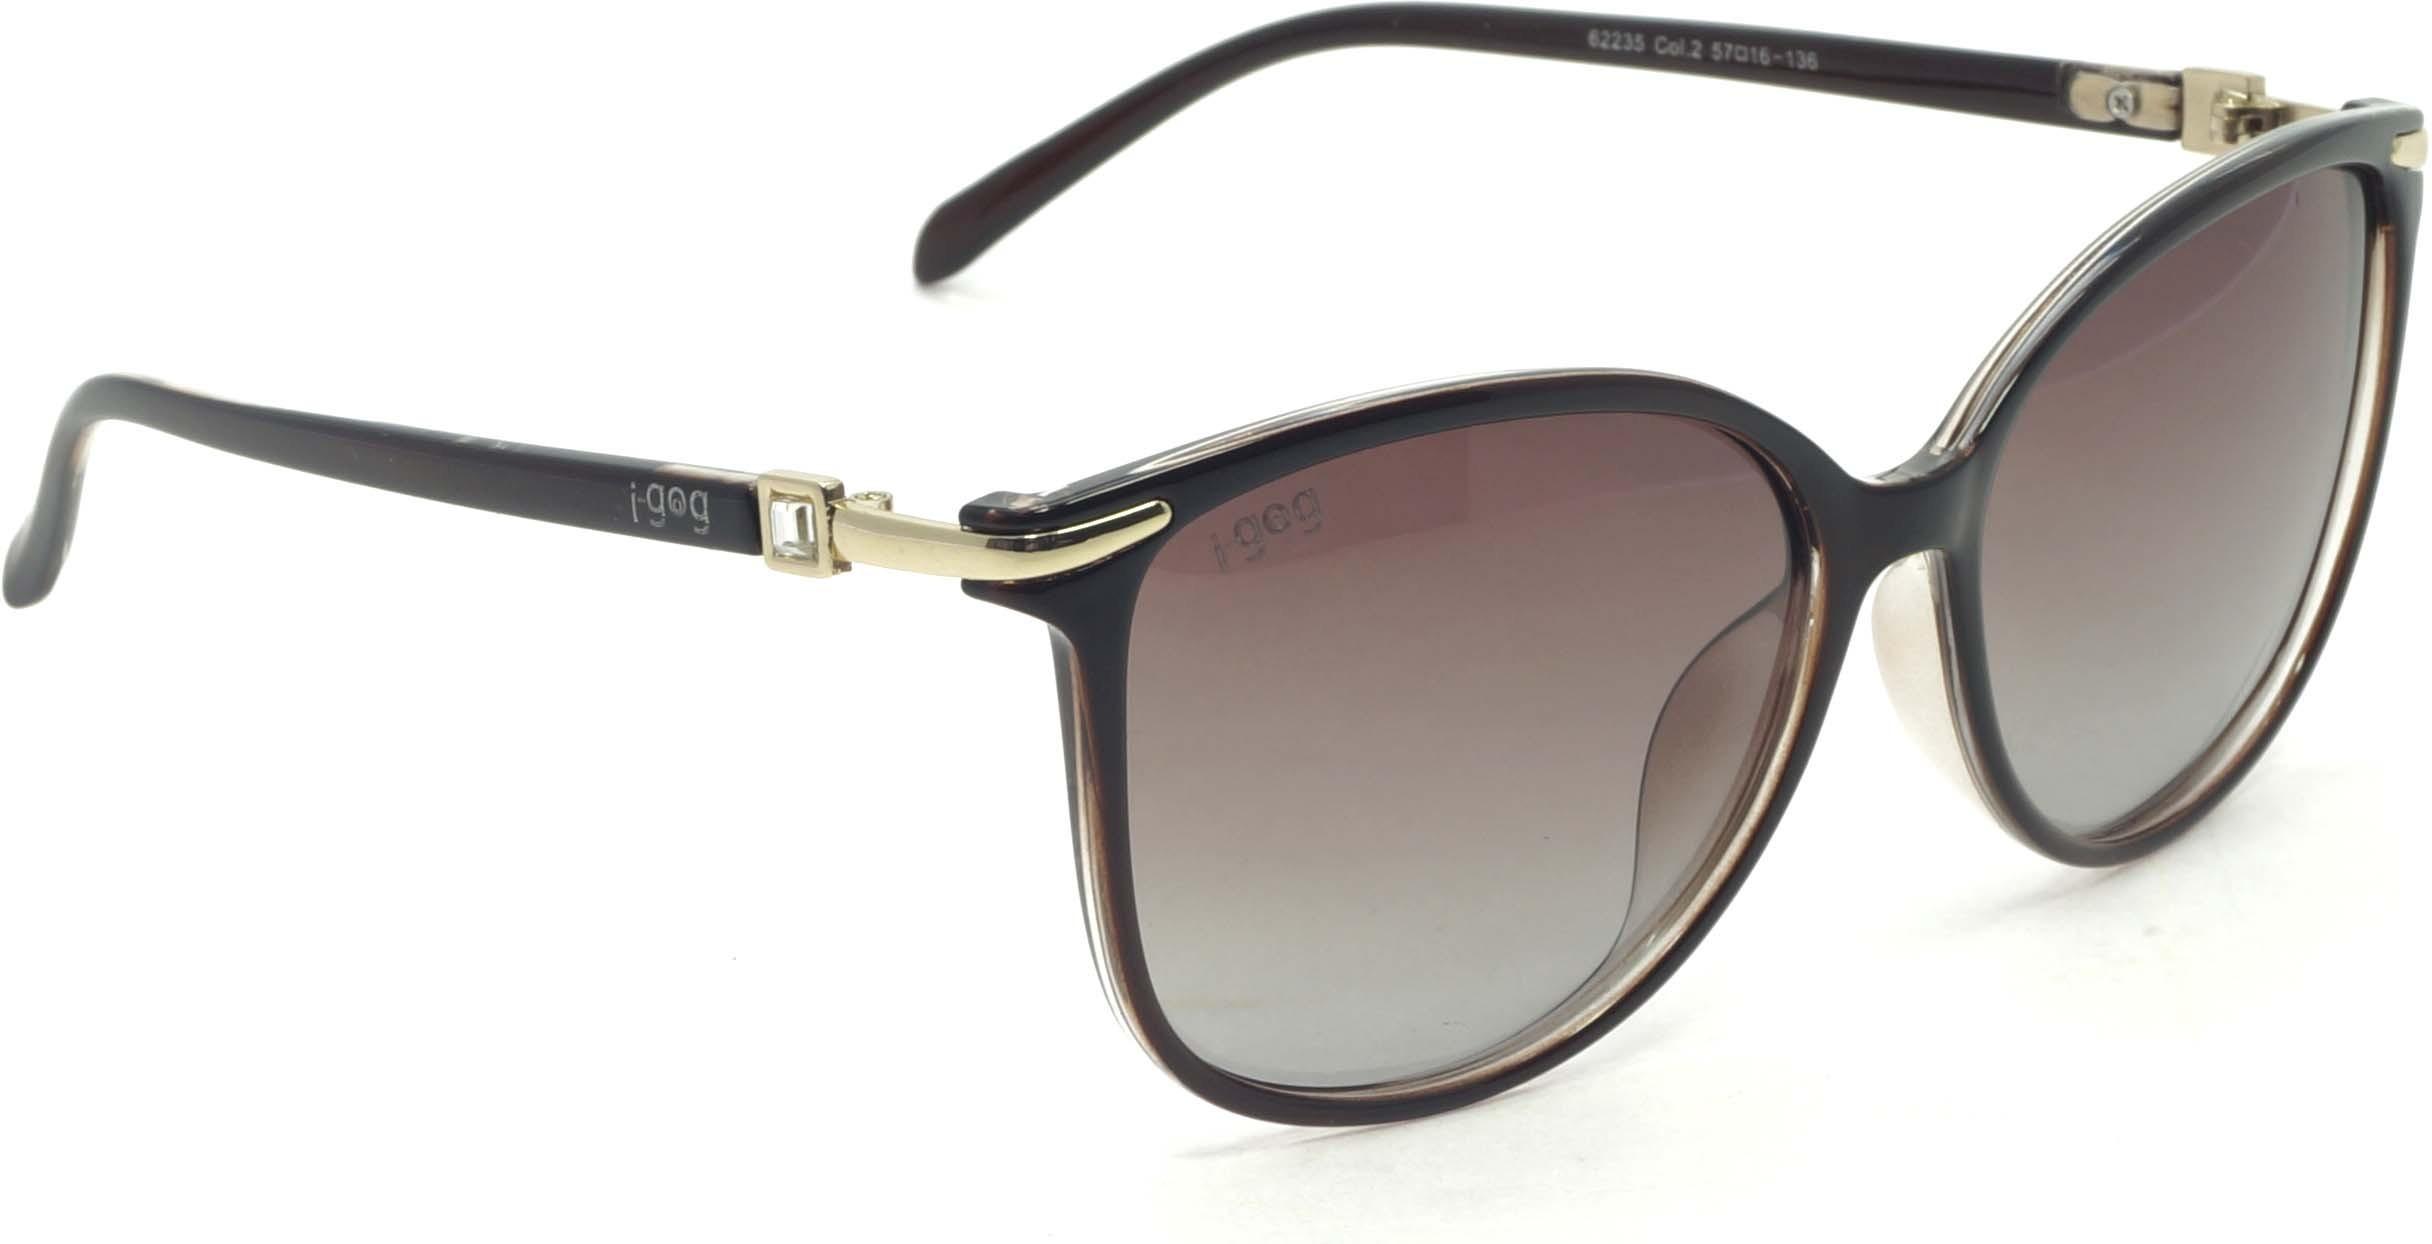 Igogs Sunglasses  i gogs sunglasses price list in india 27 04 2017 i gogs